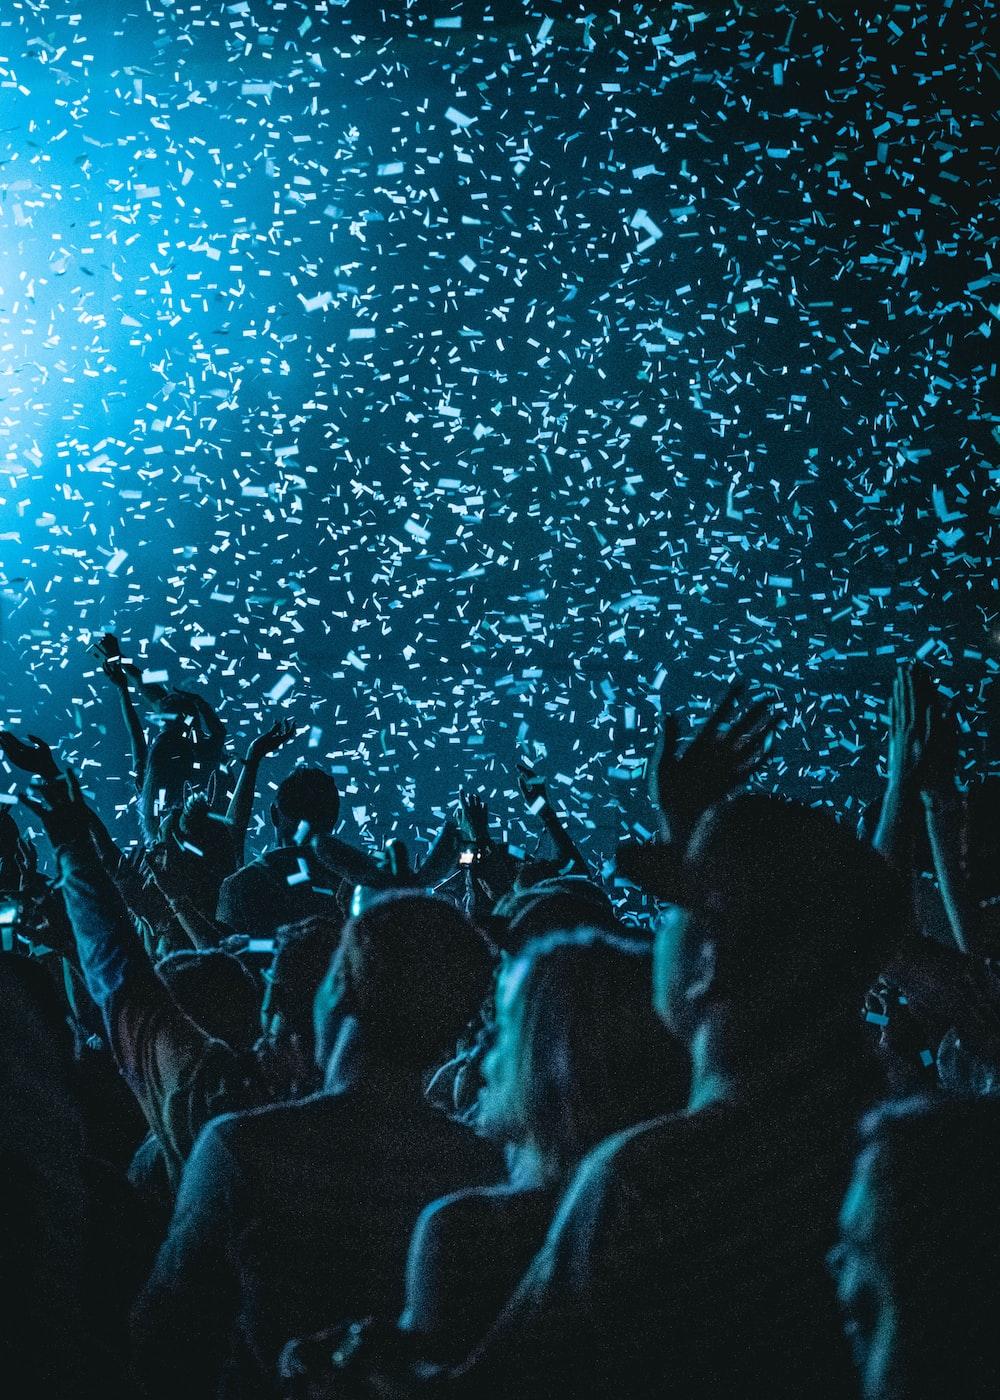 Concert Pictures Hd Download Free Images On Unsplash